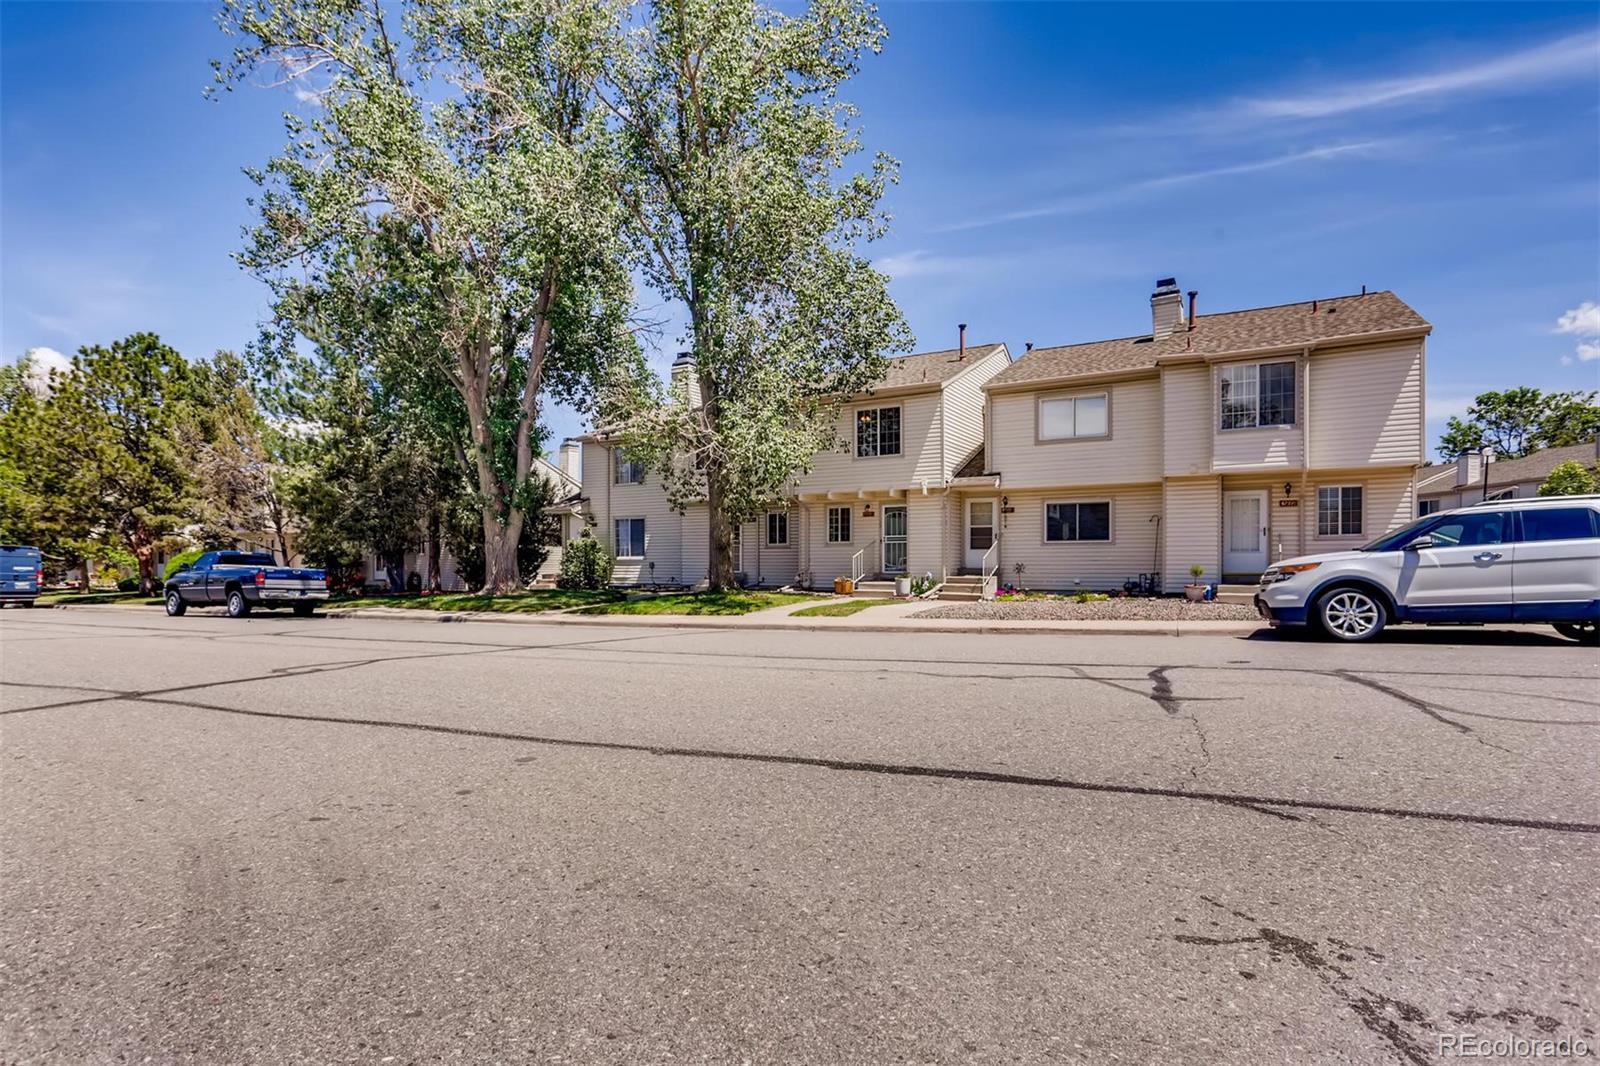 4239 S Mobile Circle #C Property Photo - Aurora, CO real estate listing